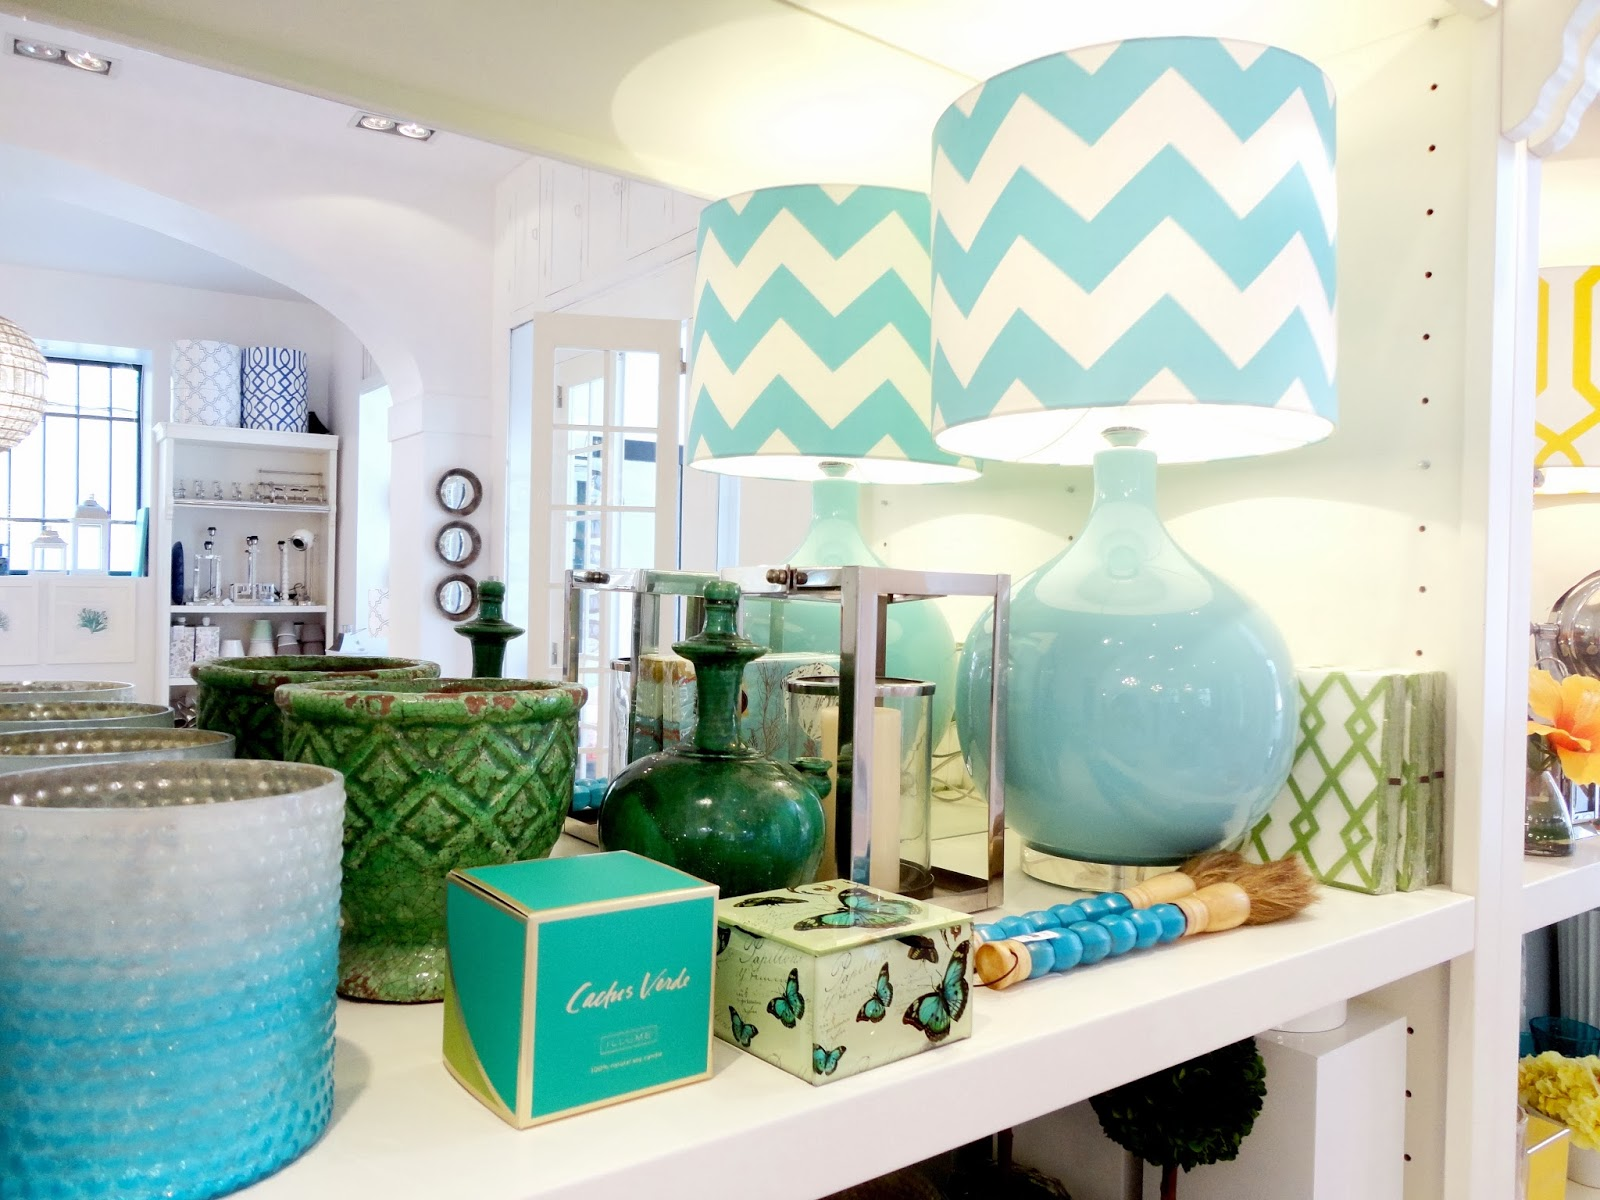 Home styling ana antunes mystore - Decoradora de interiores ...